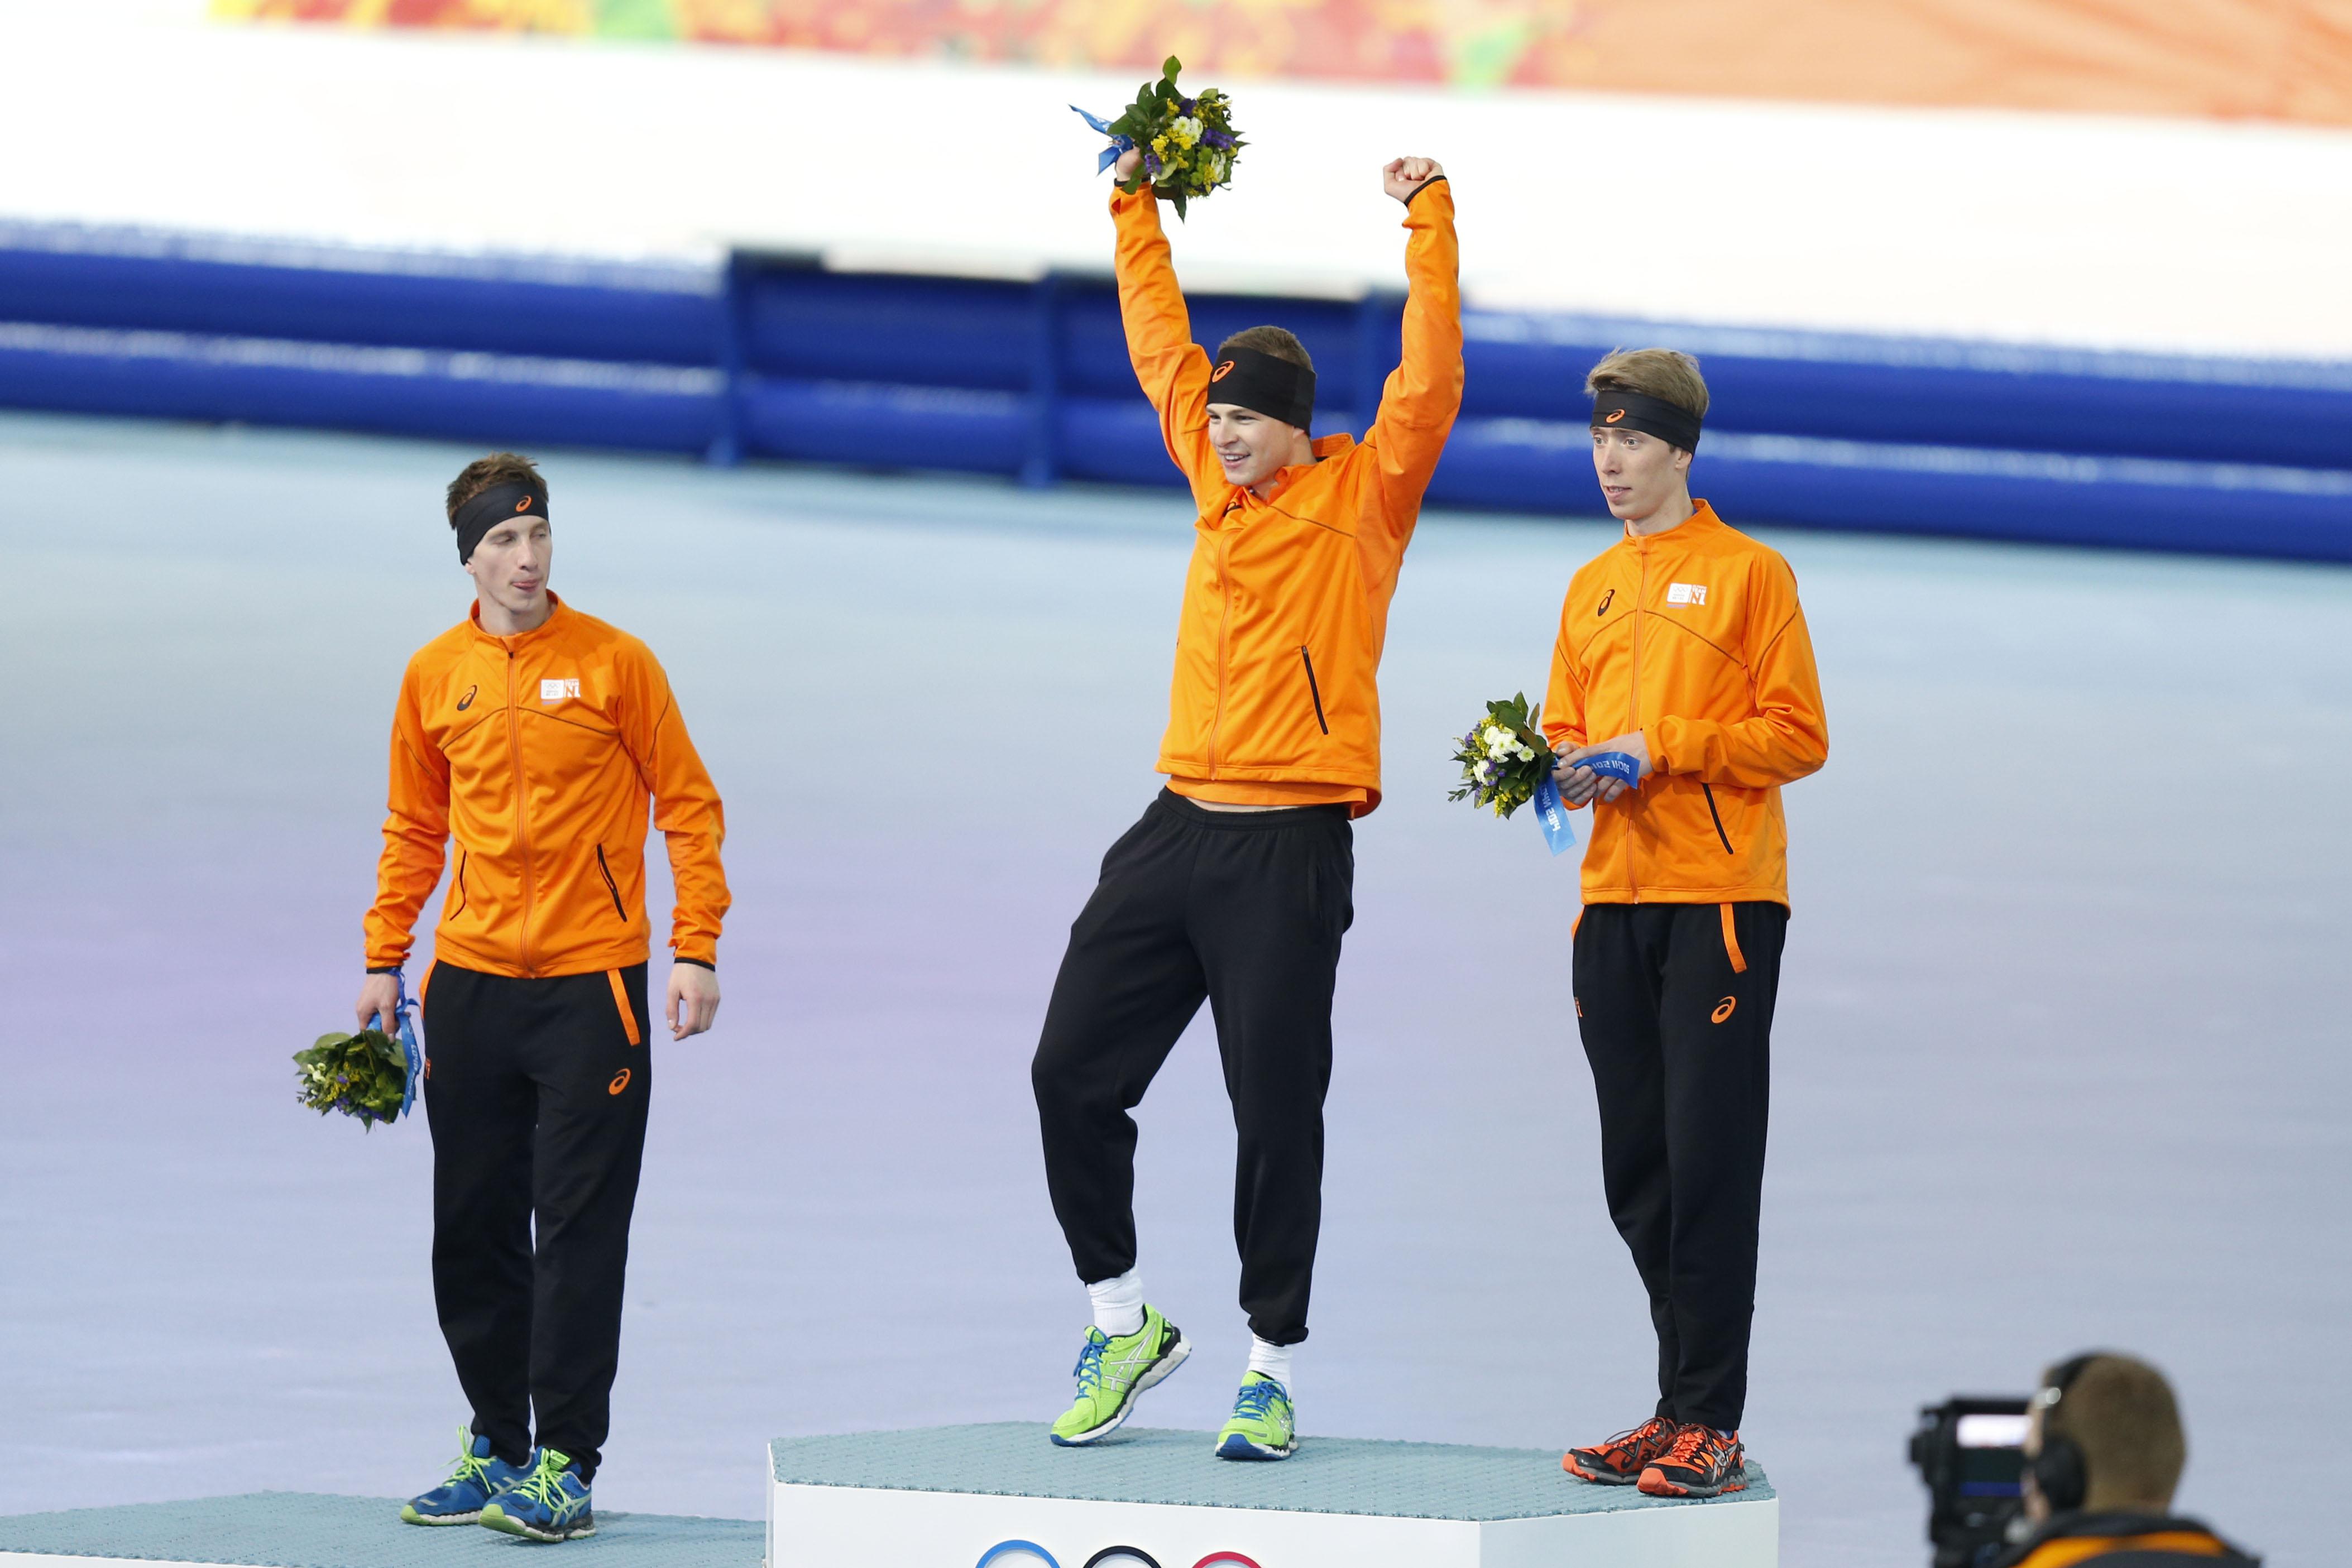 Sven Kramer, center, Jan Blokhuijsen, left, and Jorrit Bergsma, right, celebrate winning first, second, and third, respectively in the men's 5,000 meters during at Adler Arena Skating Center. (Jeff Swinger, USA TODAY Sports)